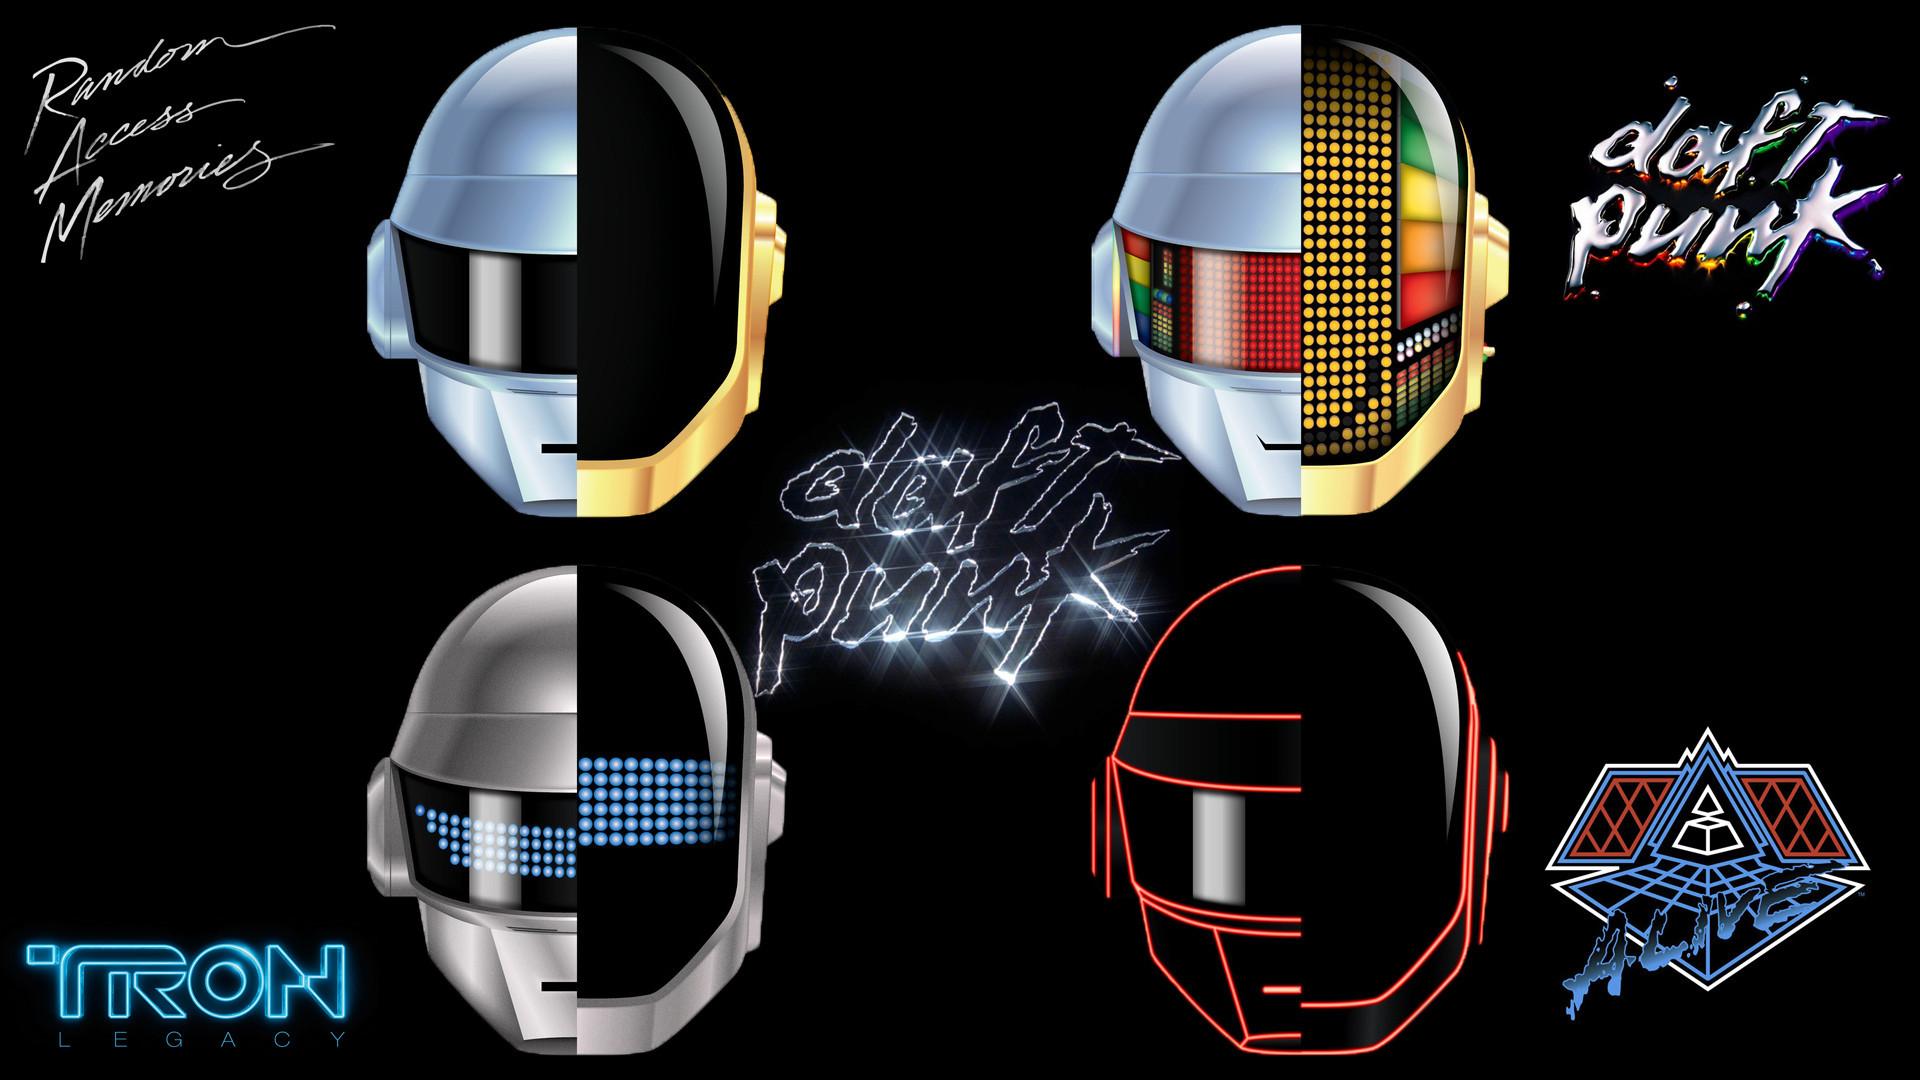 Daft Punk Backgrounds 69 Images